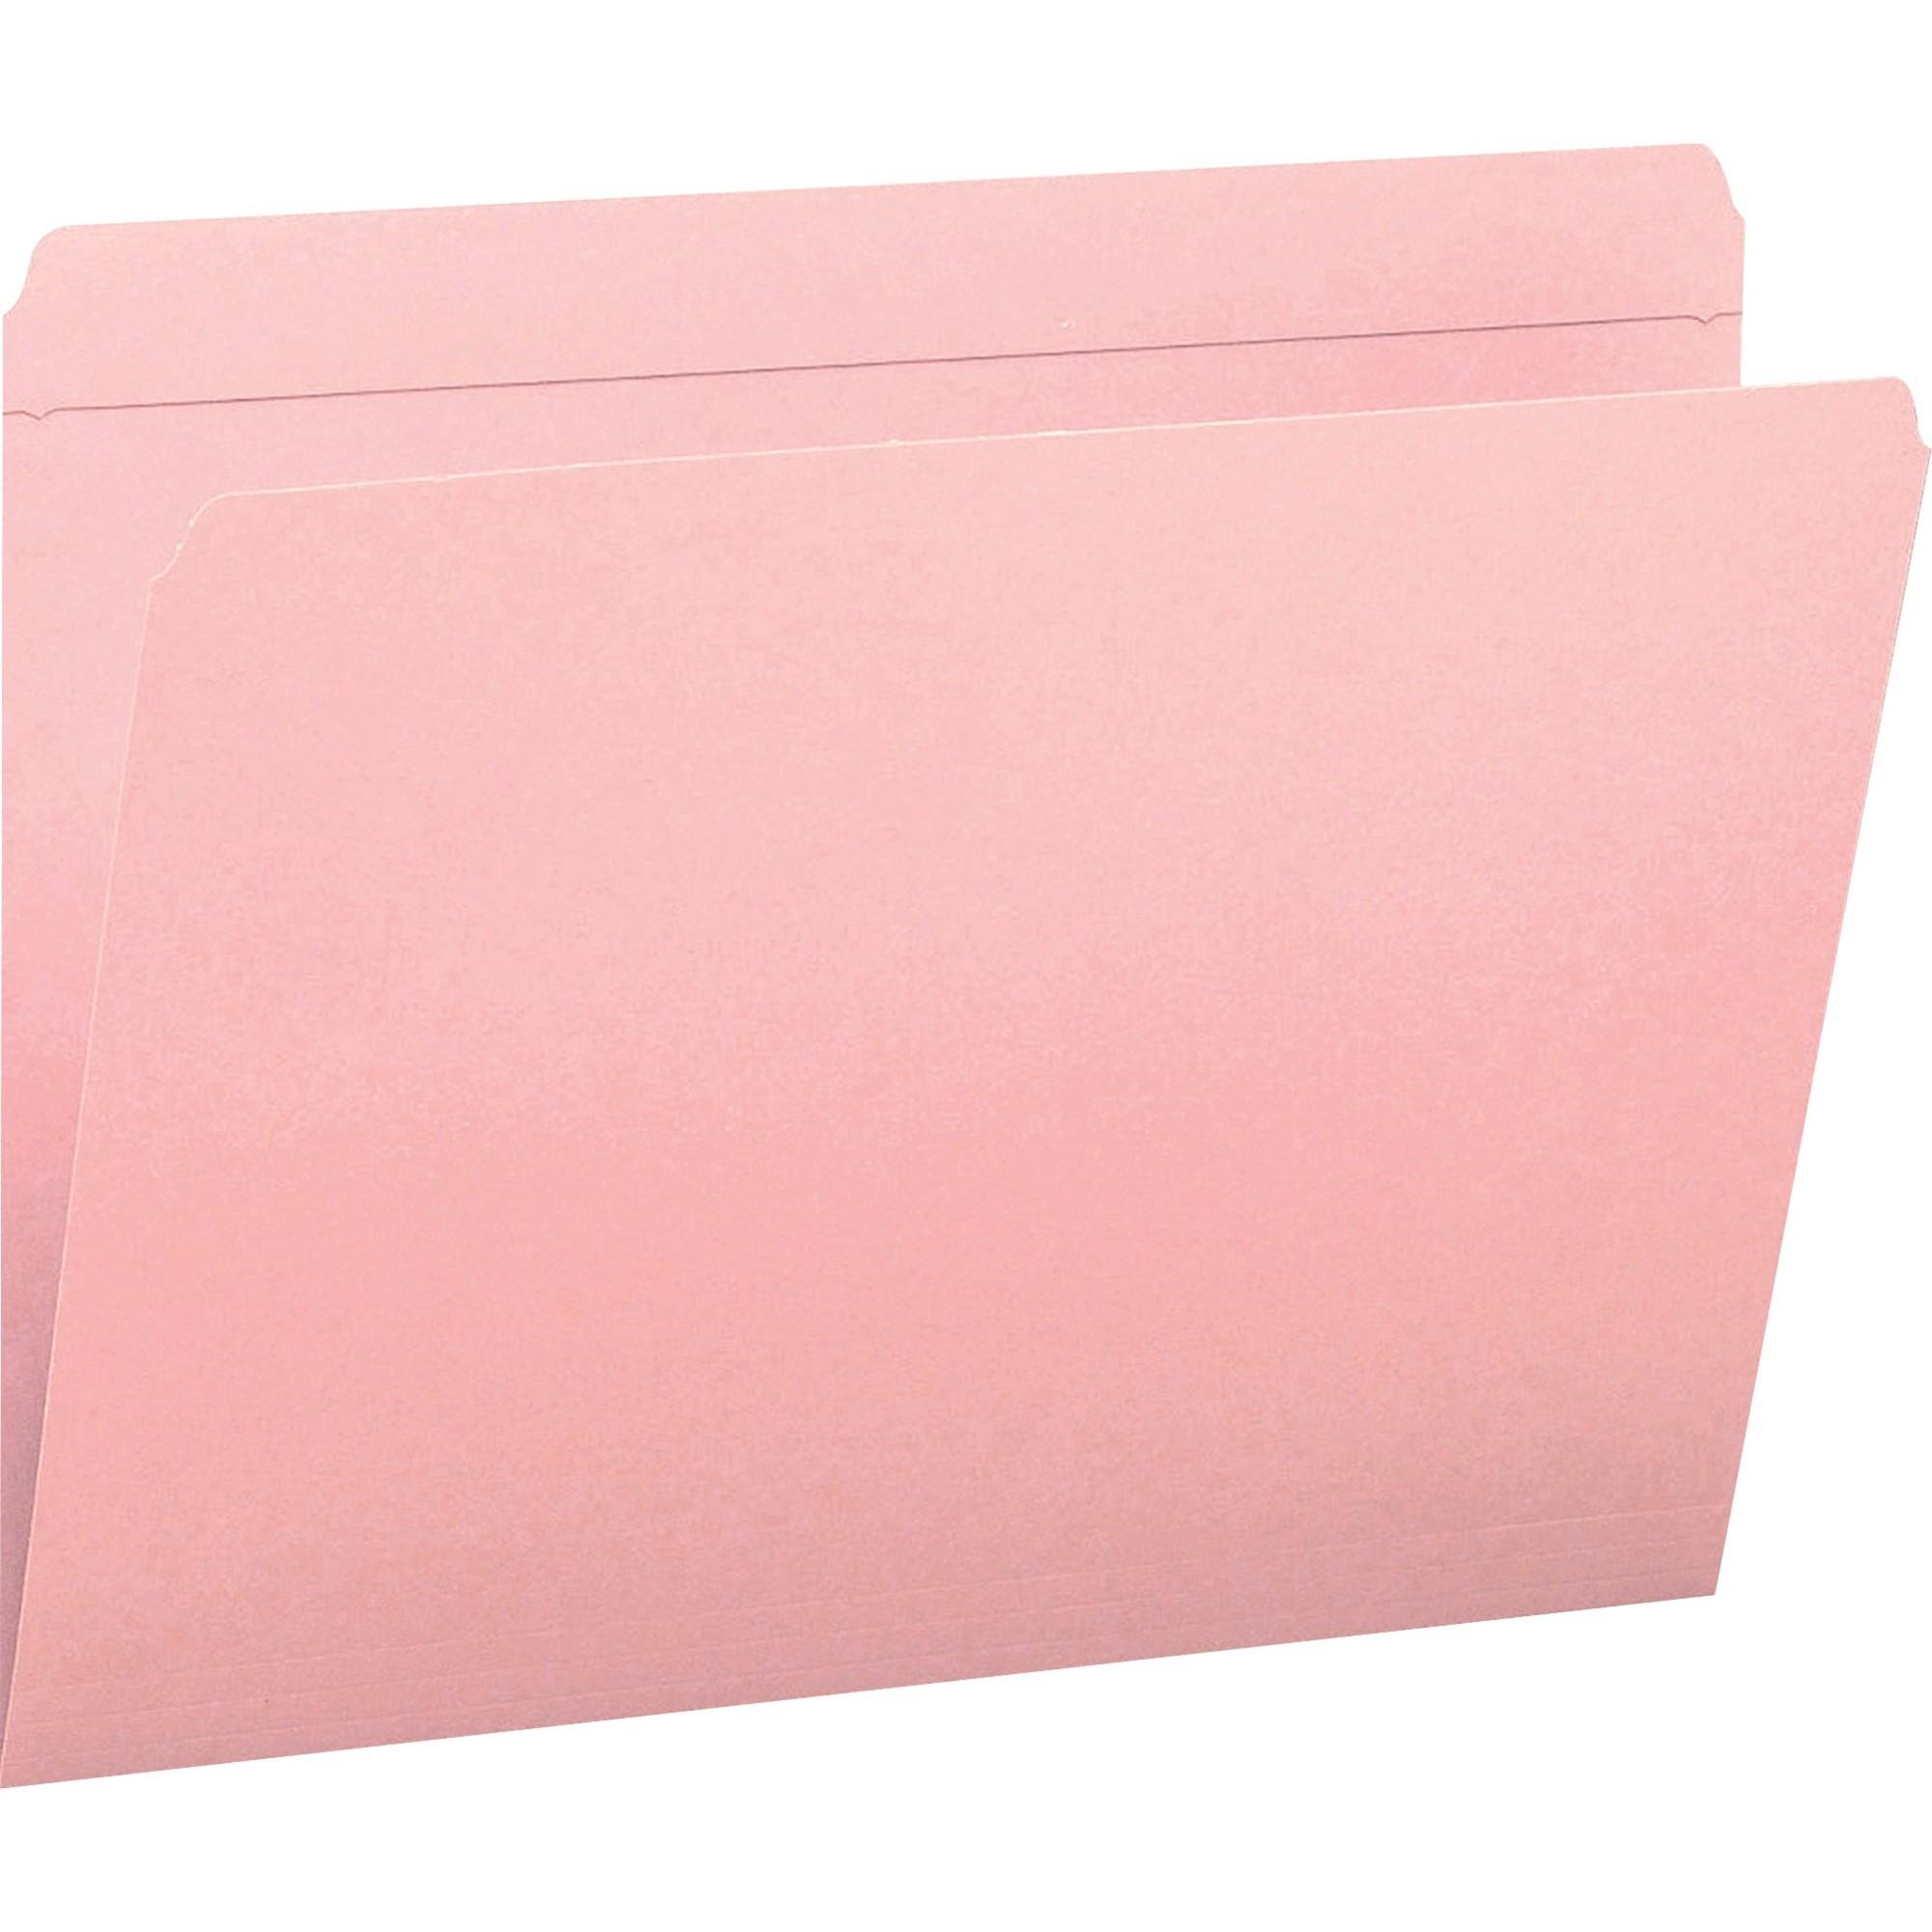 File Folders, Straight Cut, Reinforced Top Tab, Letter, Pink, 100/Box